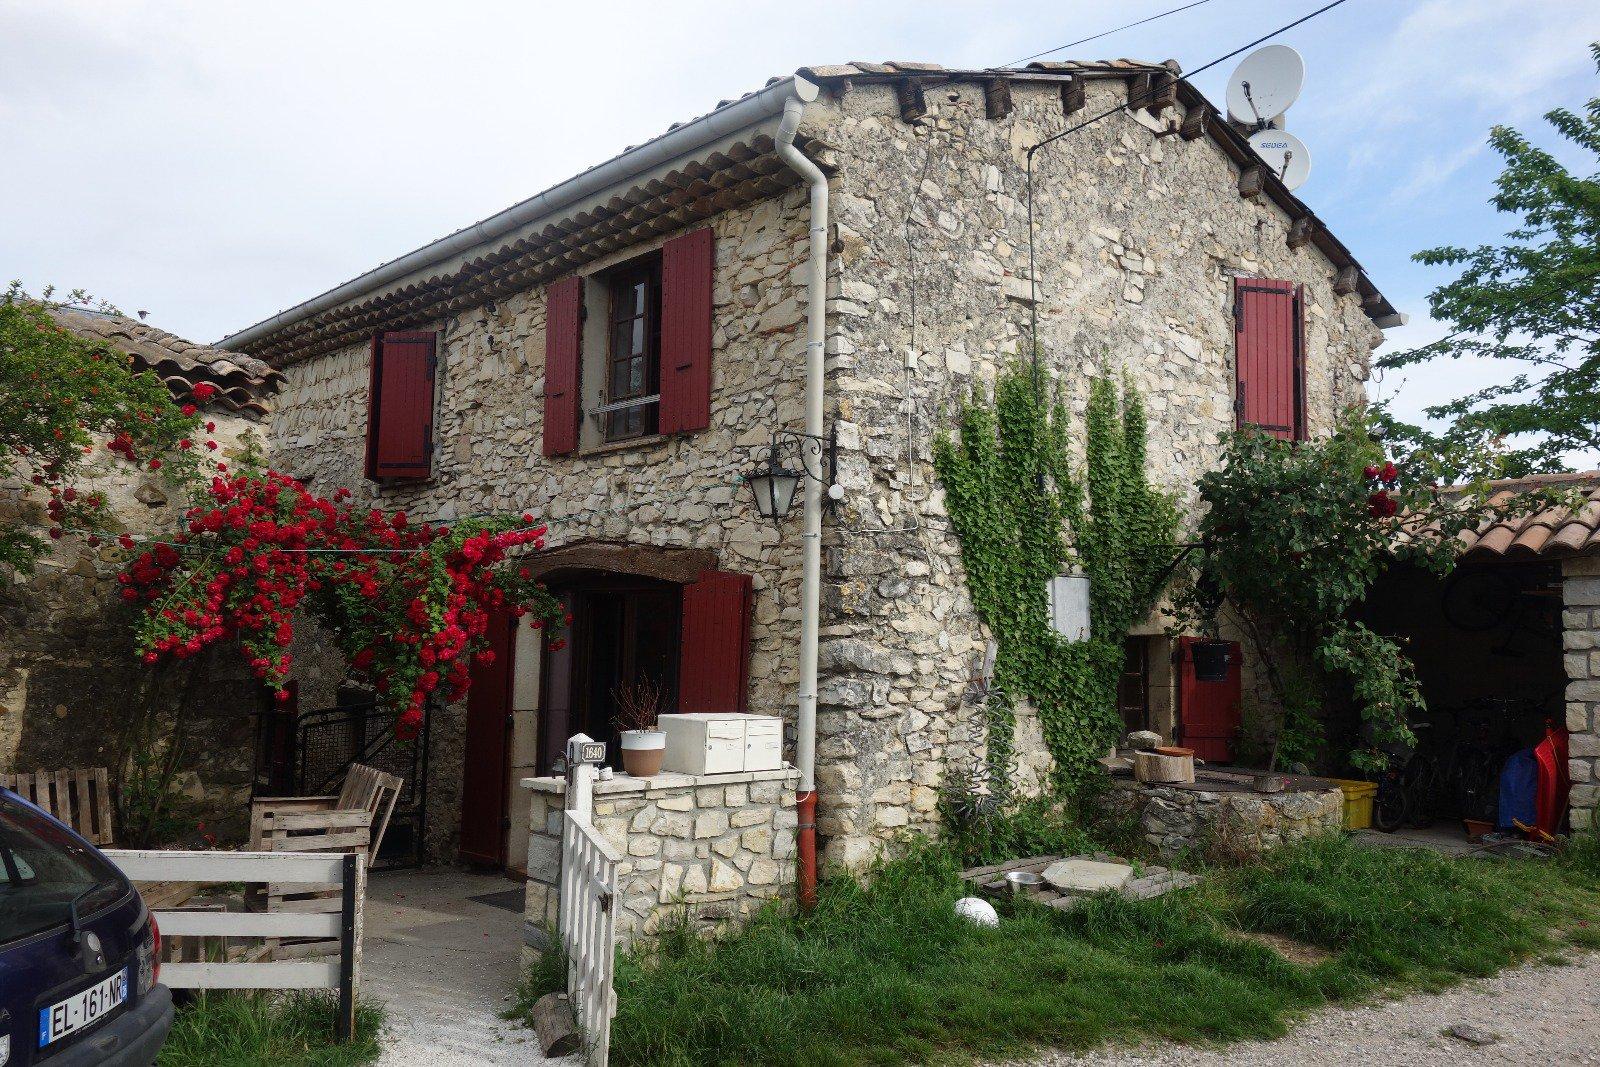 Charmante maison en pierre avec terrasse